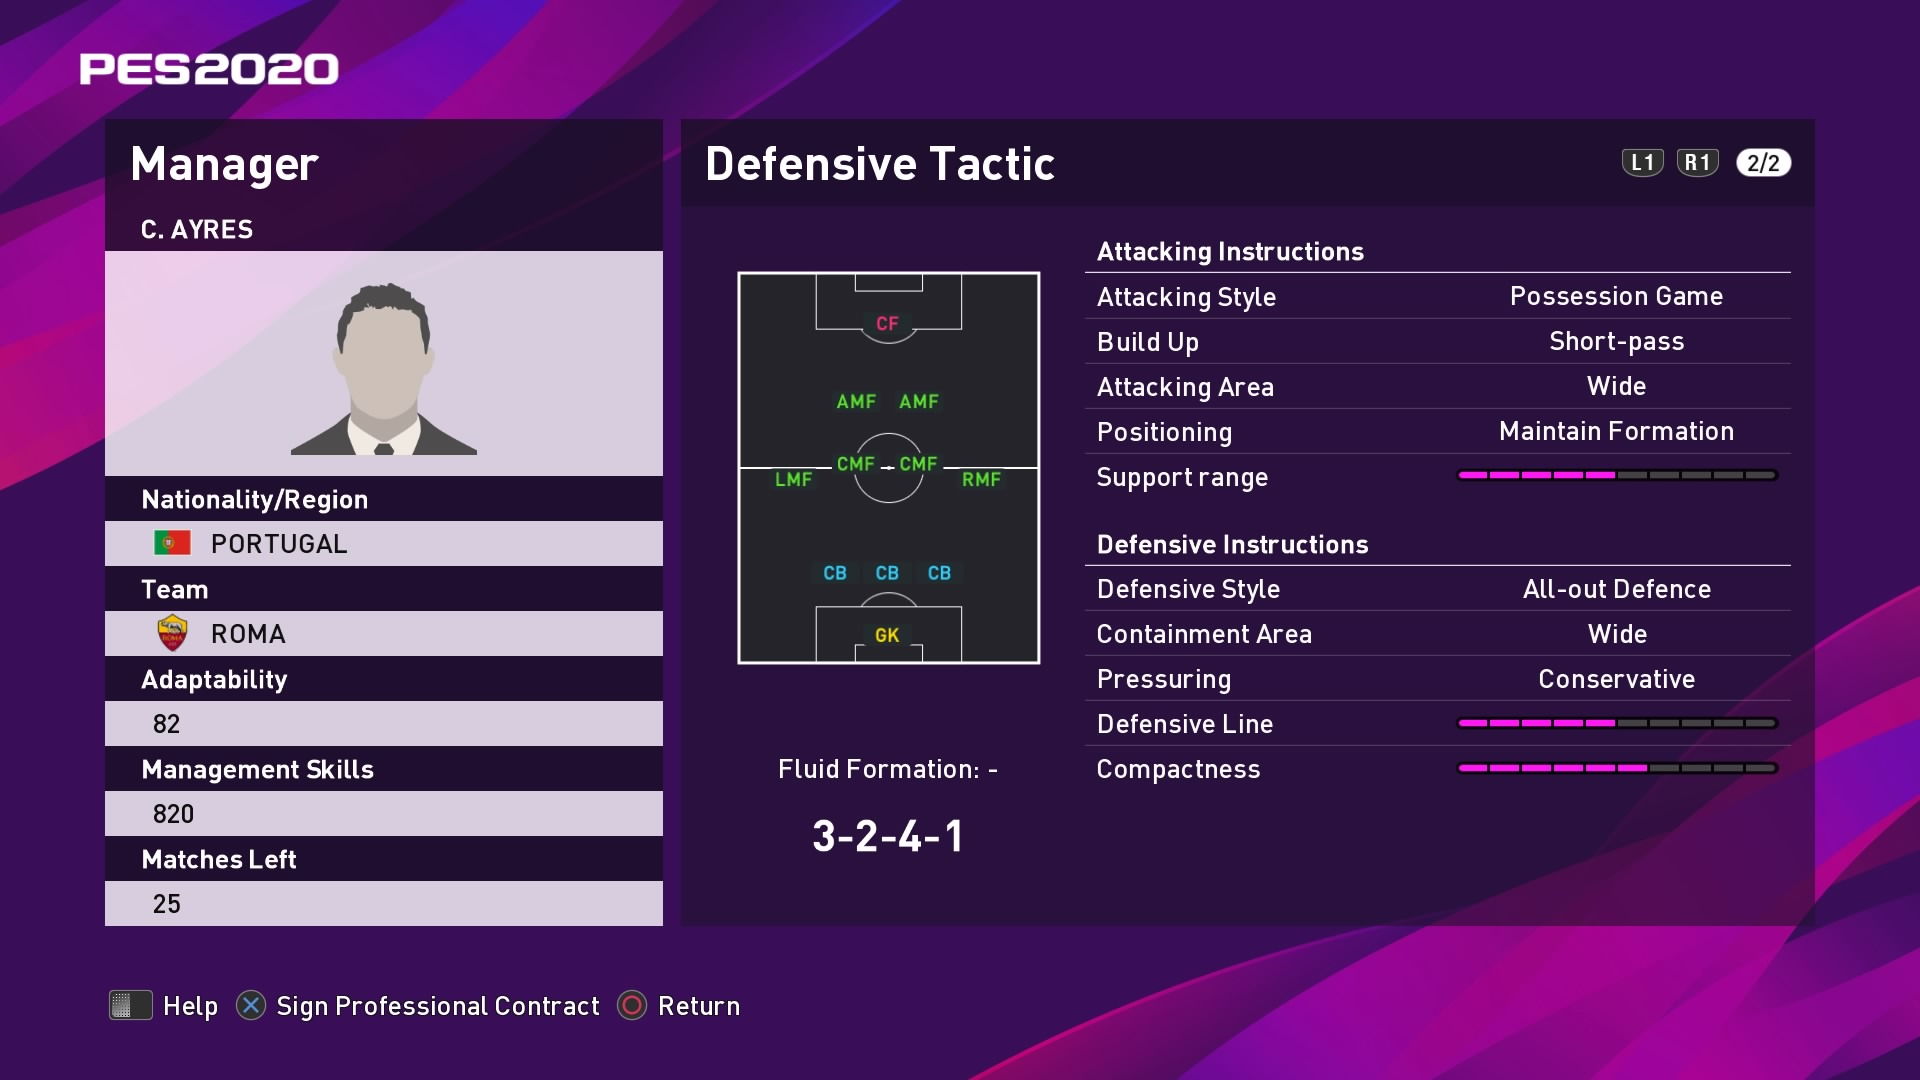 C. Ayres (2) (Paulo Fonseca) Defensive Tactic in PES 2020 myClub